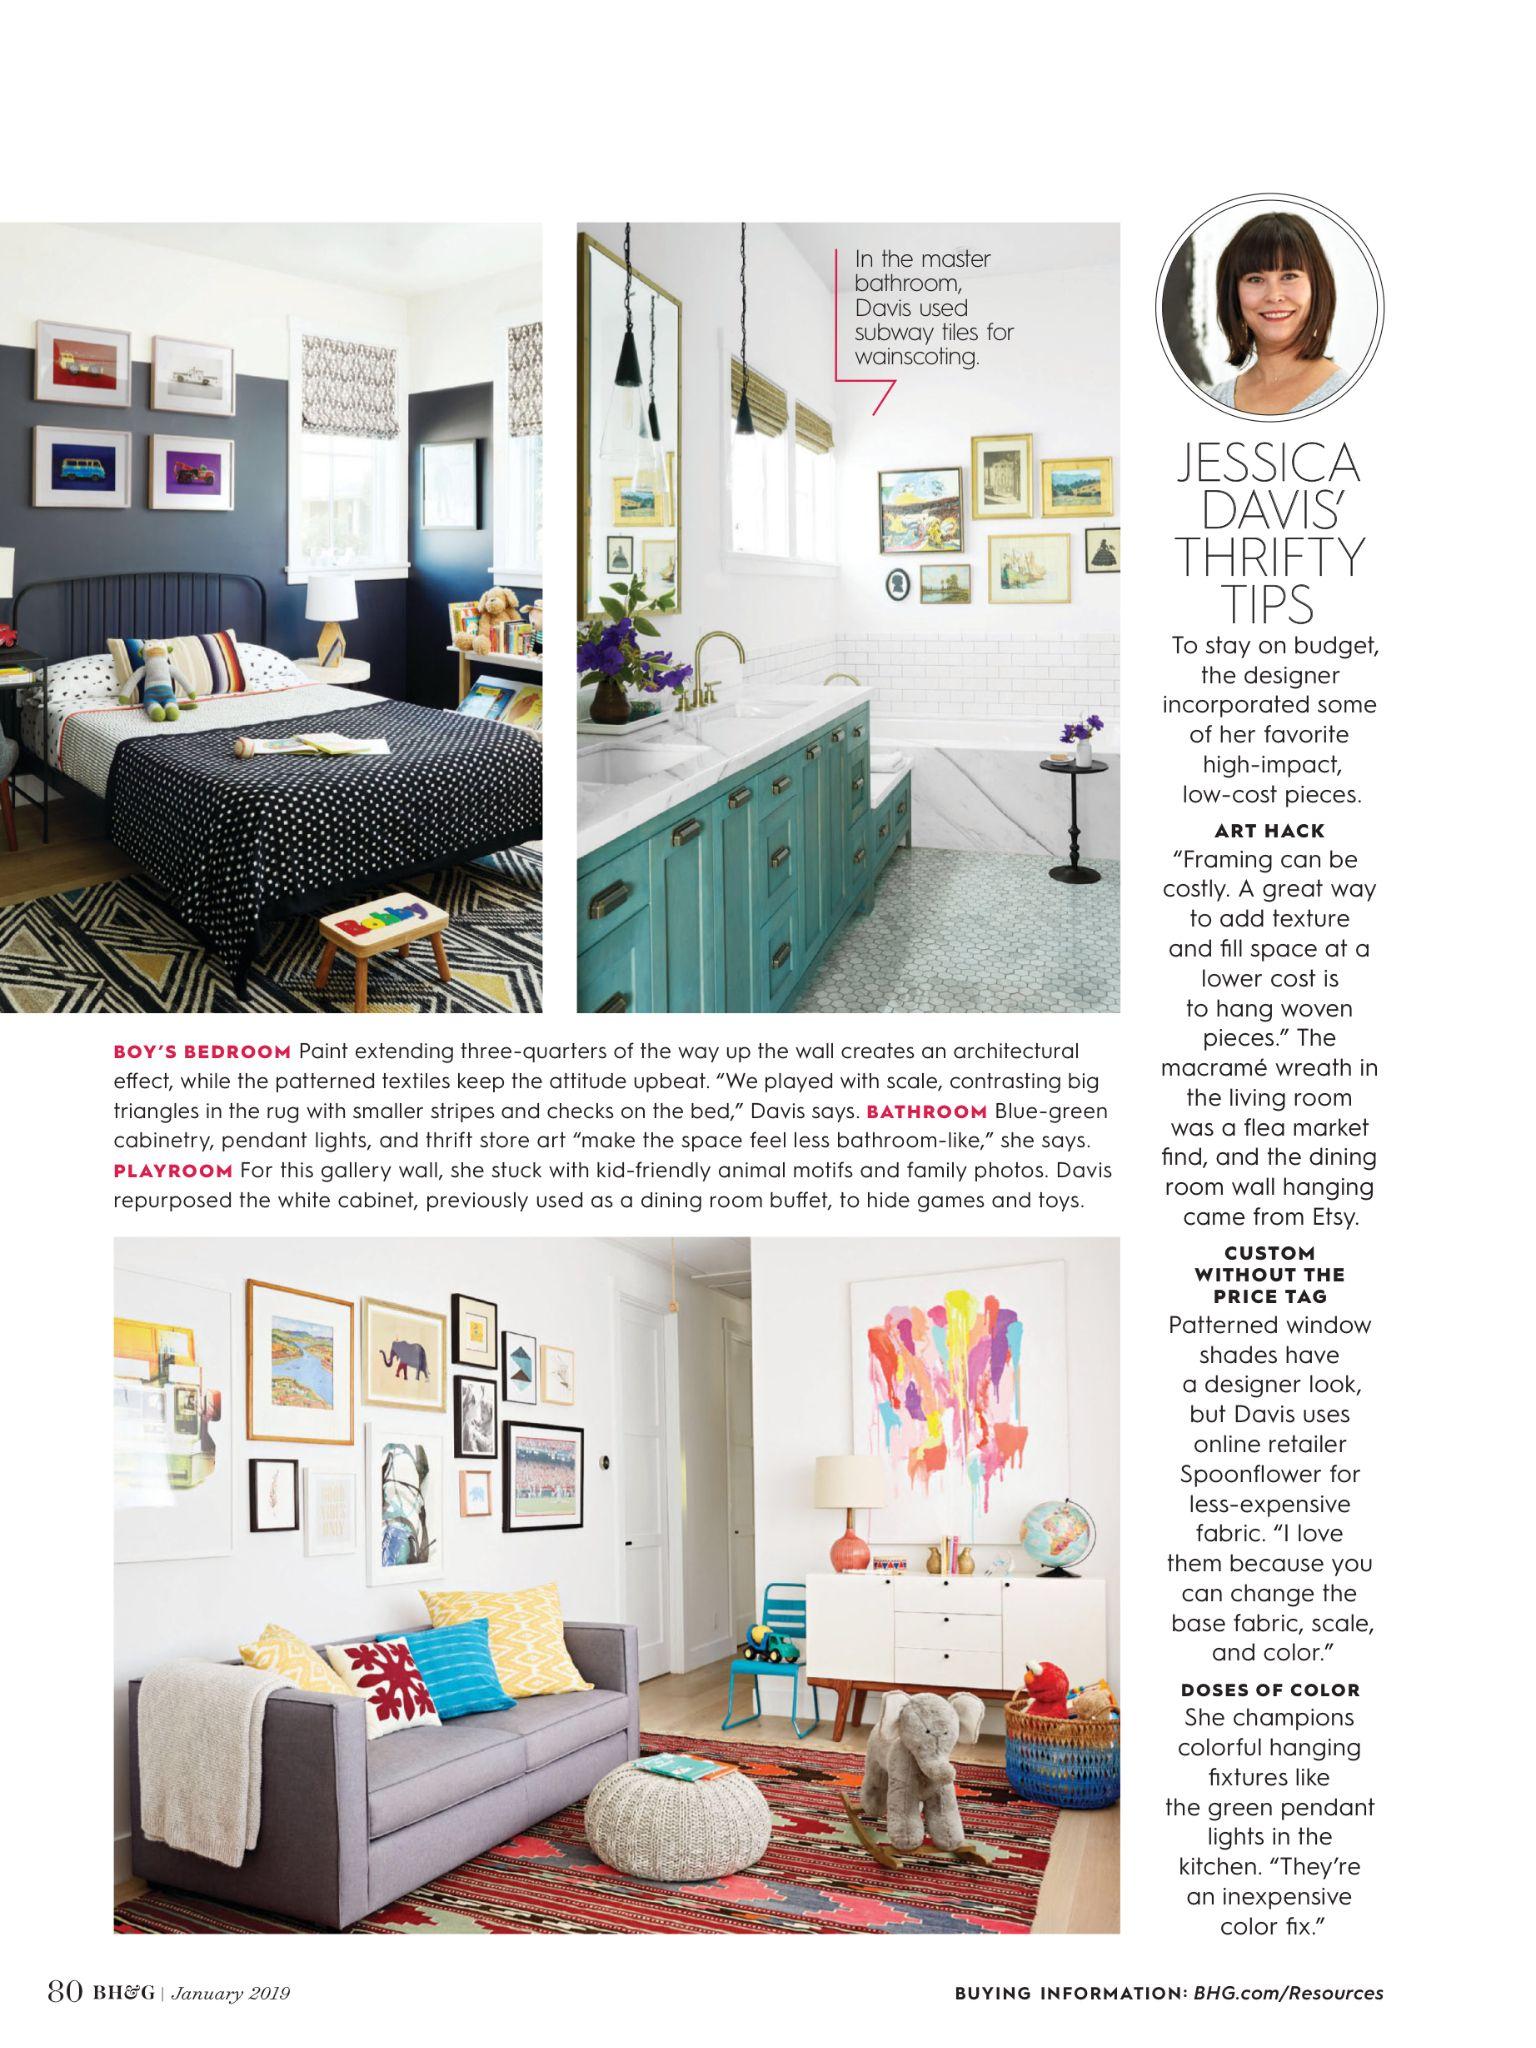 074d525ede9944e496f528603bebba63 - January 2019 Better Homes And Gardens Magazine